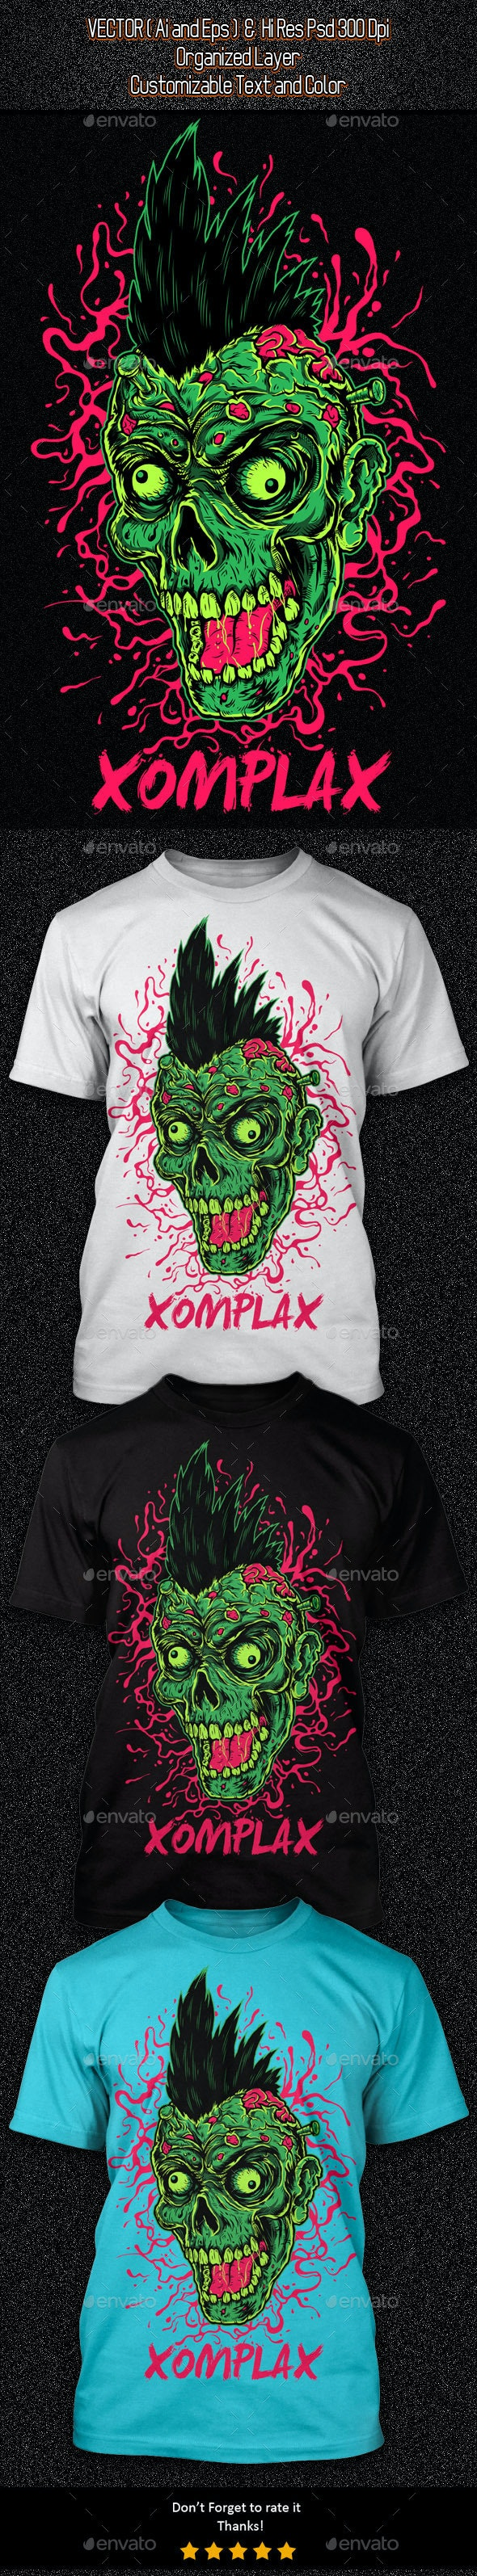 Zombie Punk Illustration - Grunge Designs